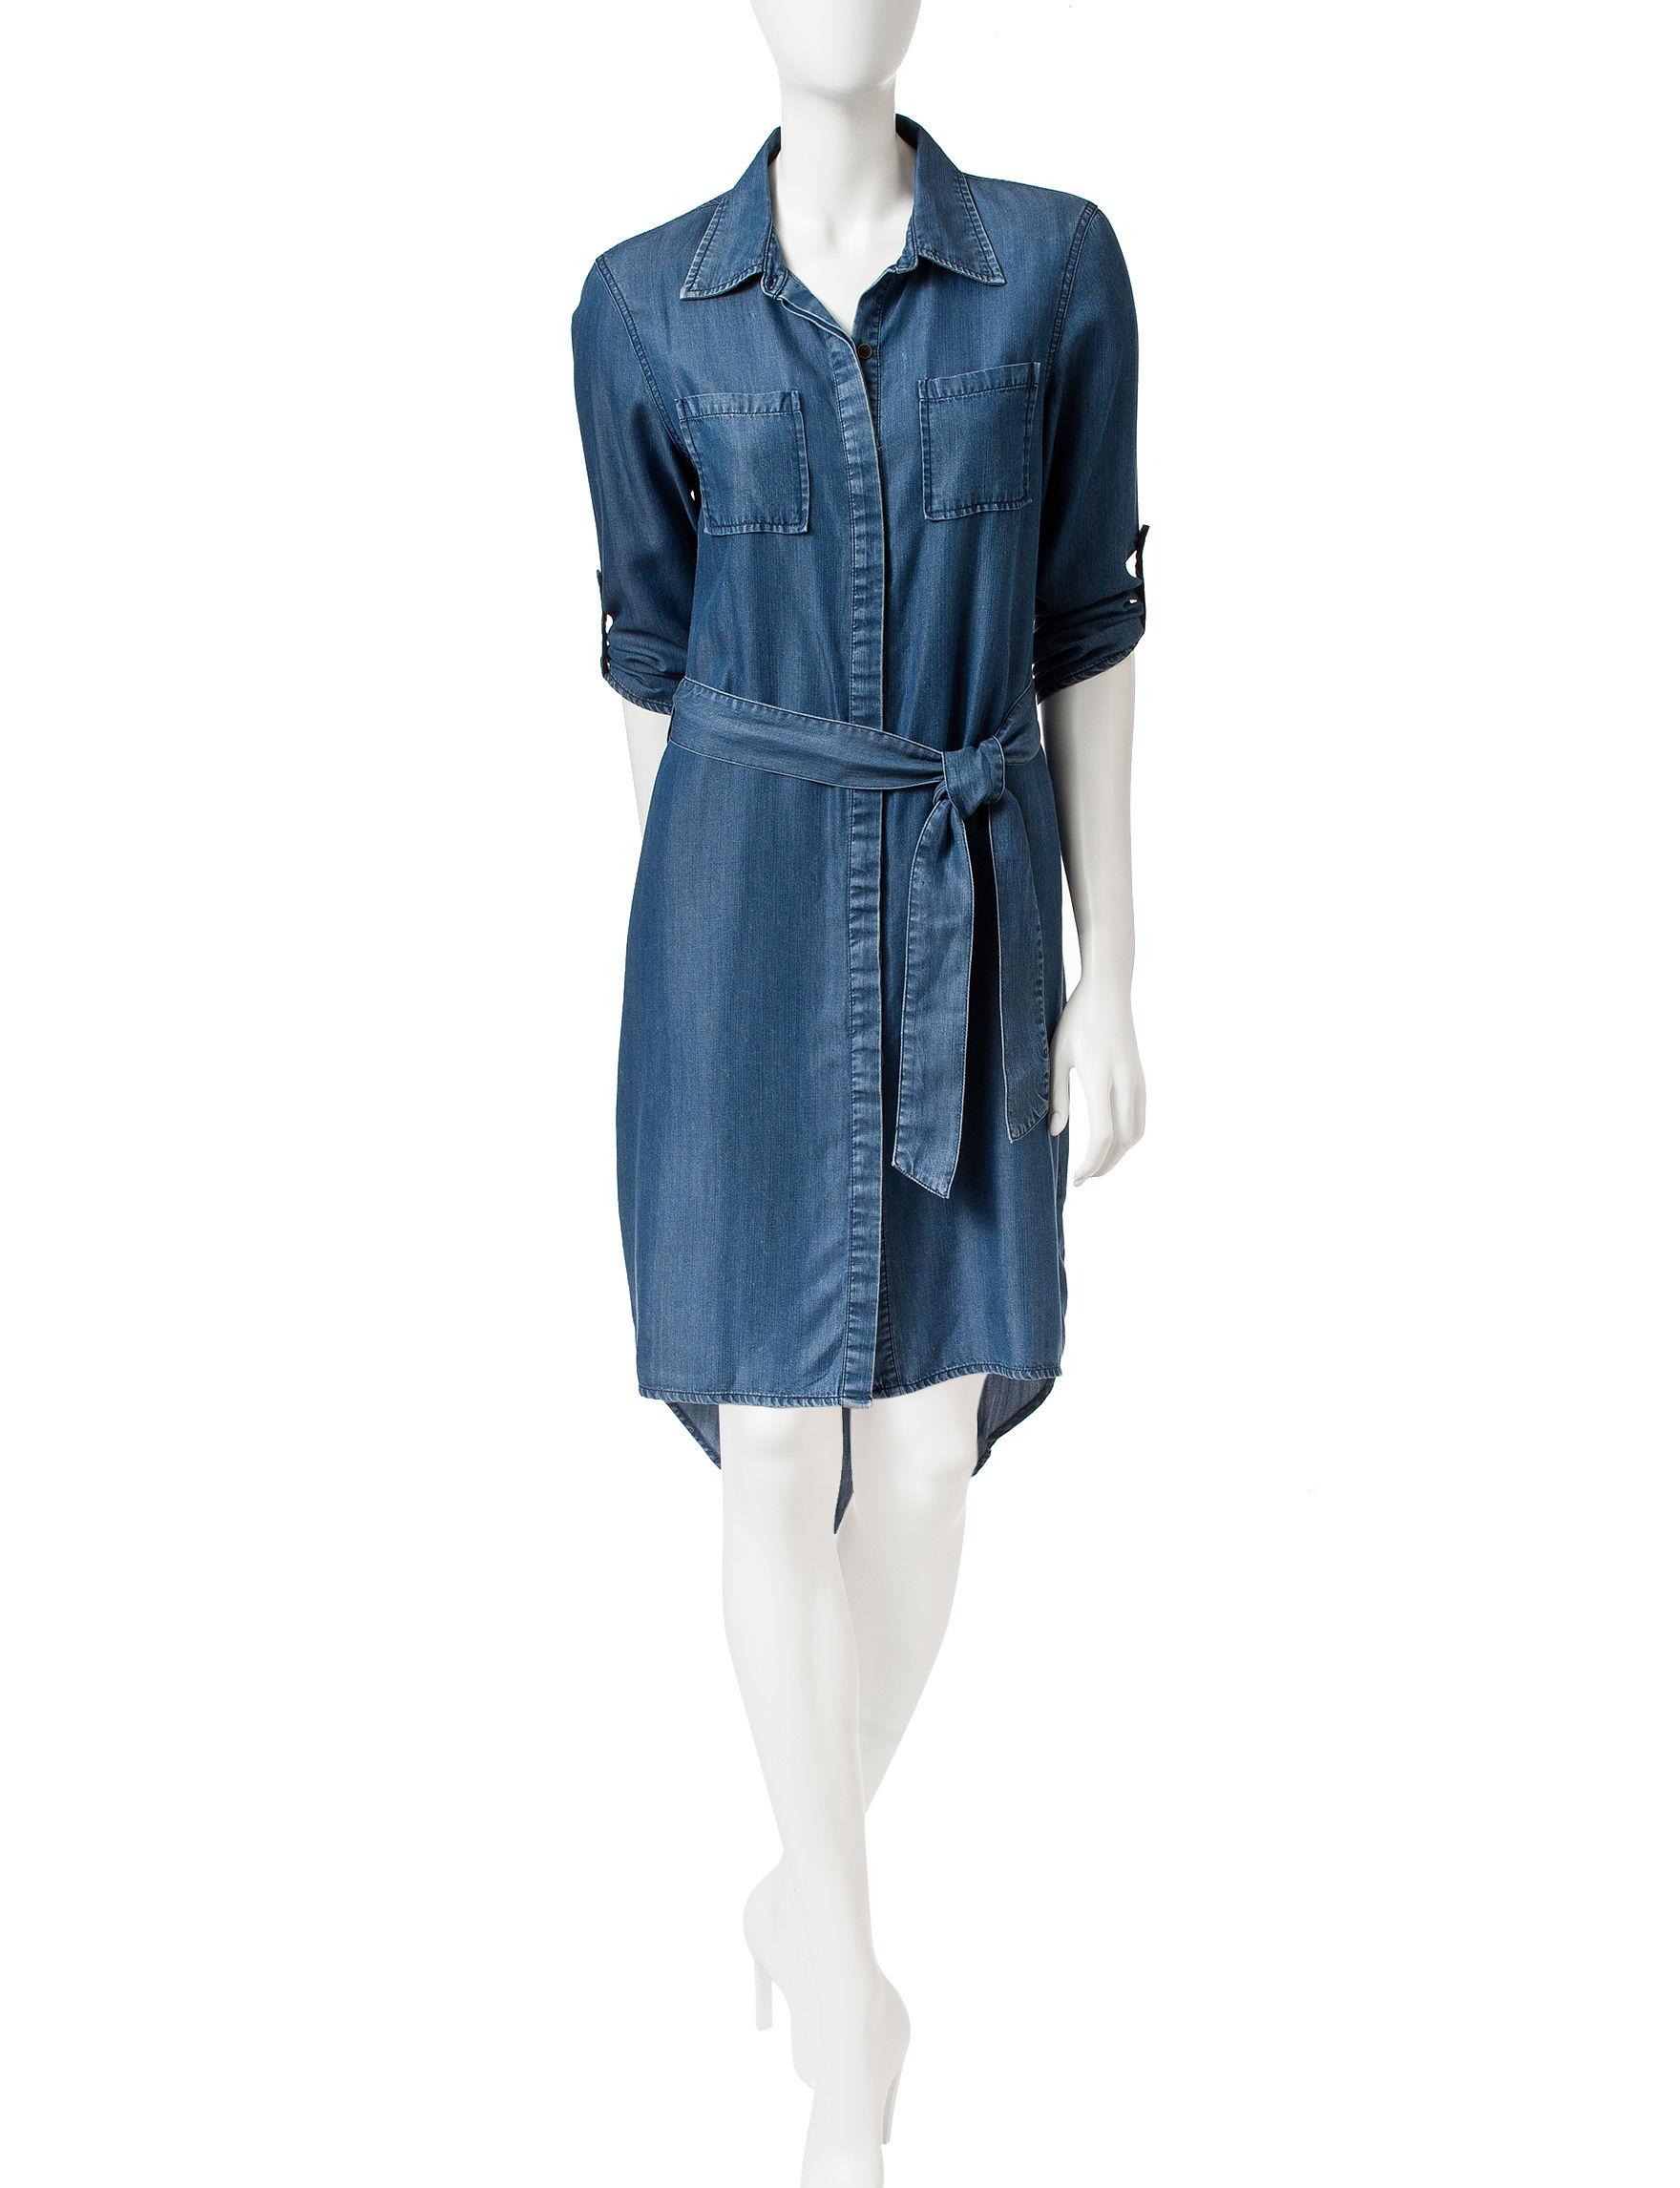 Signature Studio Chambray Everyday & Casual Shirt Dresses